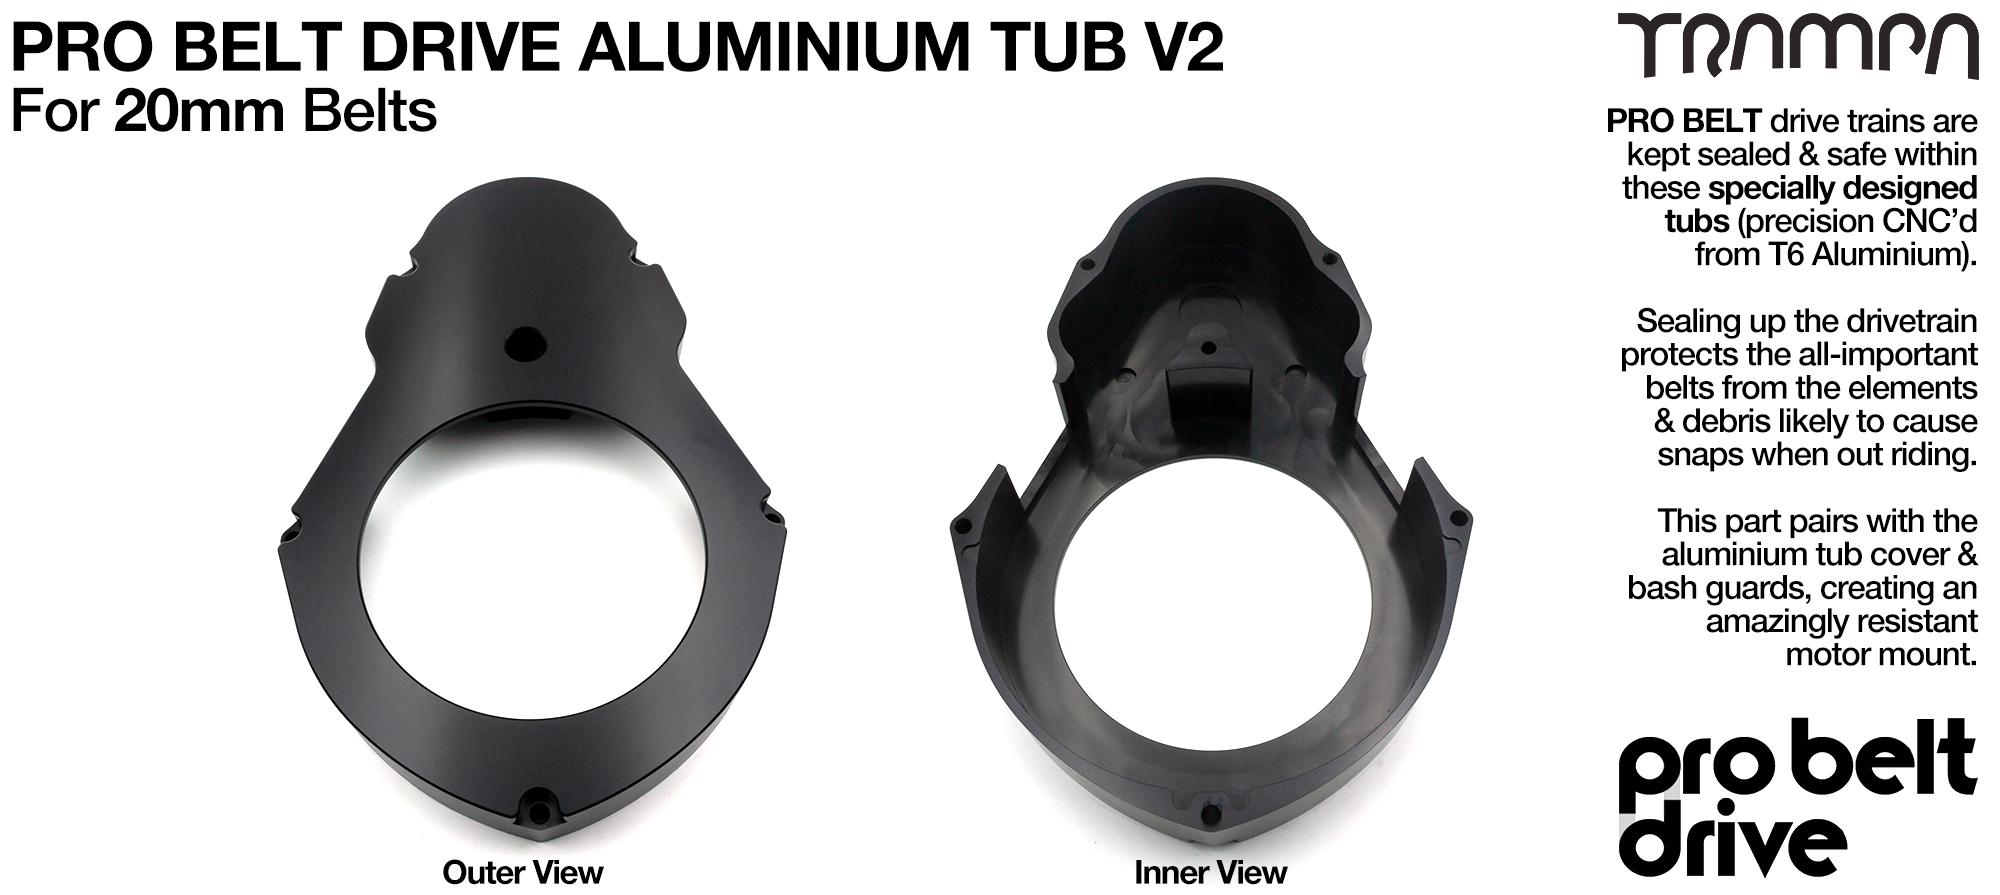 PRO Belt Motor Mount Aluminum TUB - V3